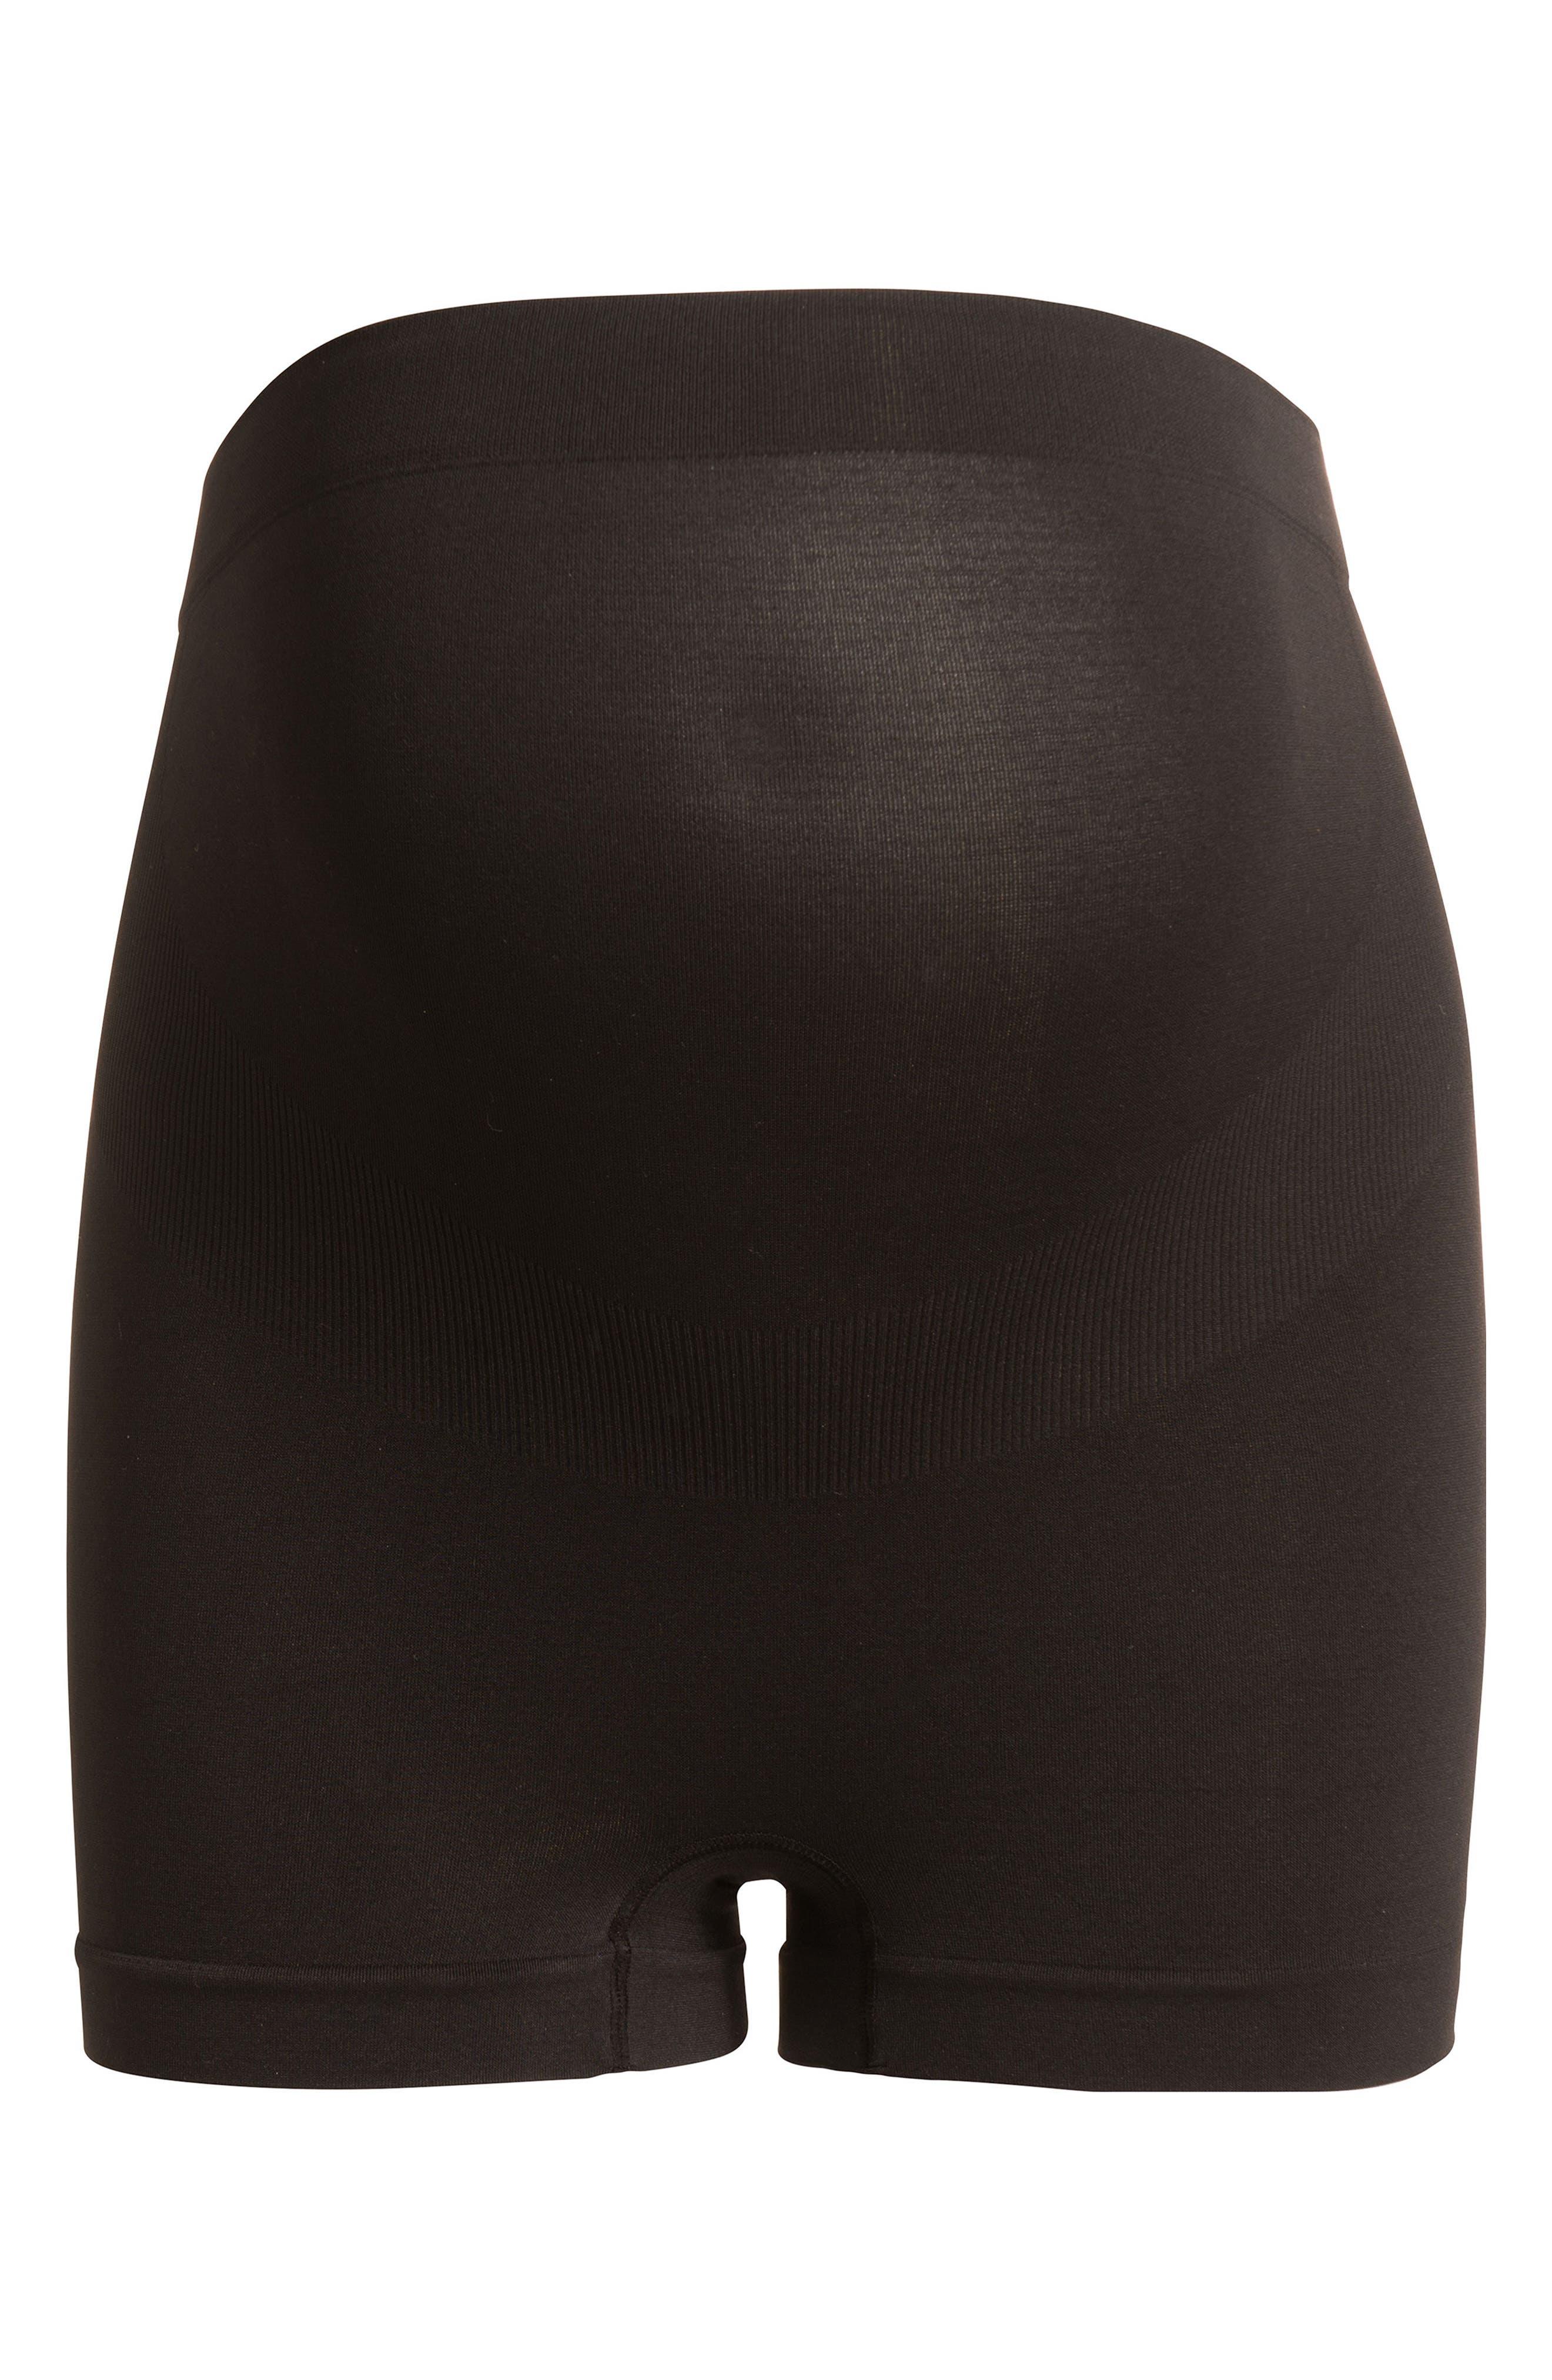 Seamless Maternity Shorts,                         Main,                         color, BLACK